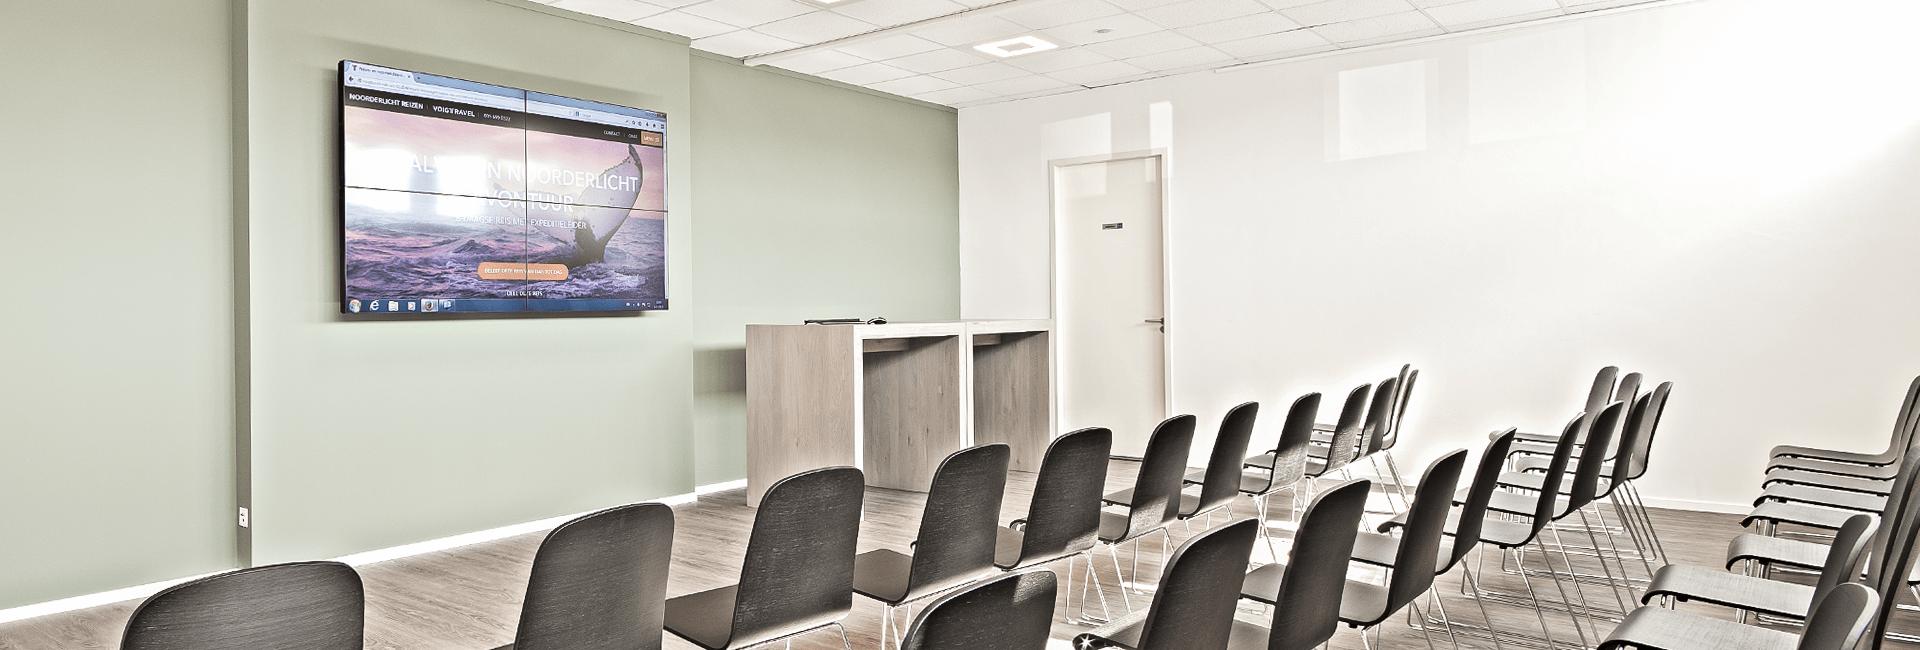 kantoorinrichting-voigt-travel